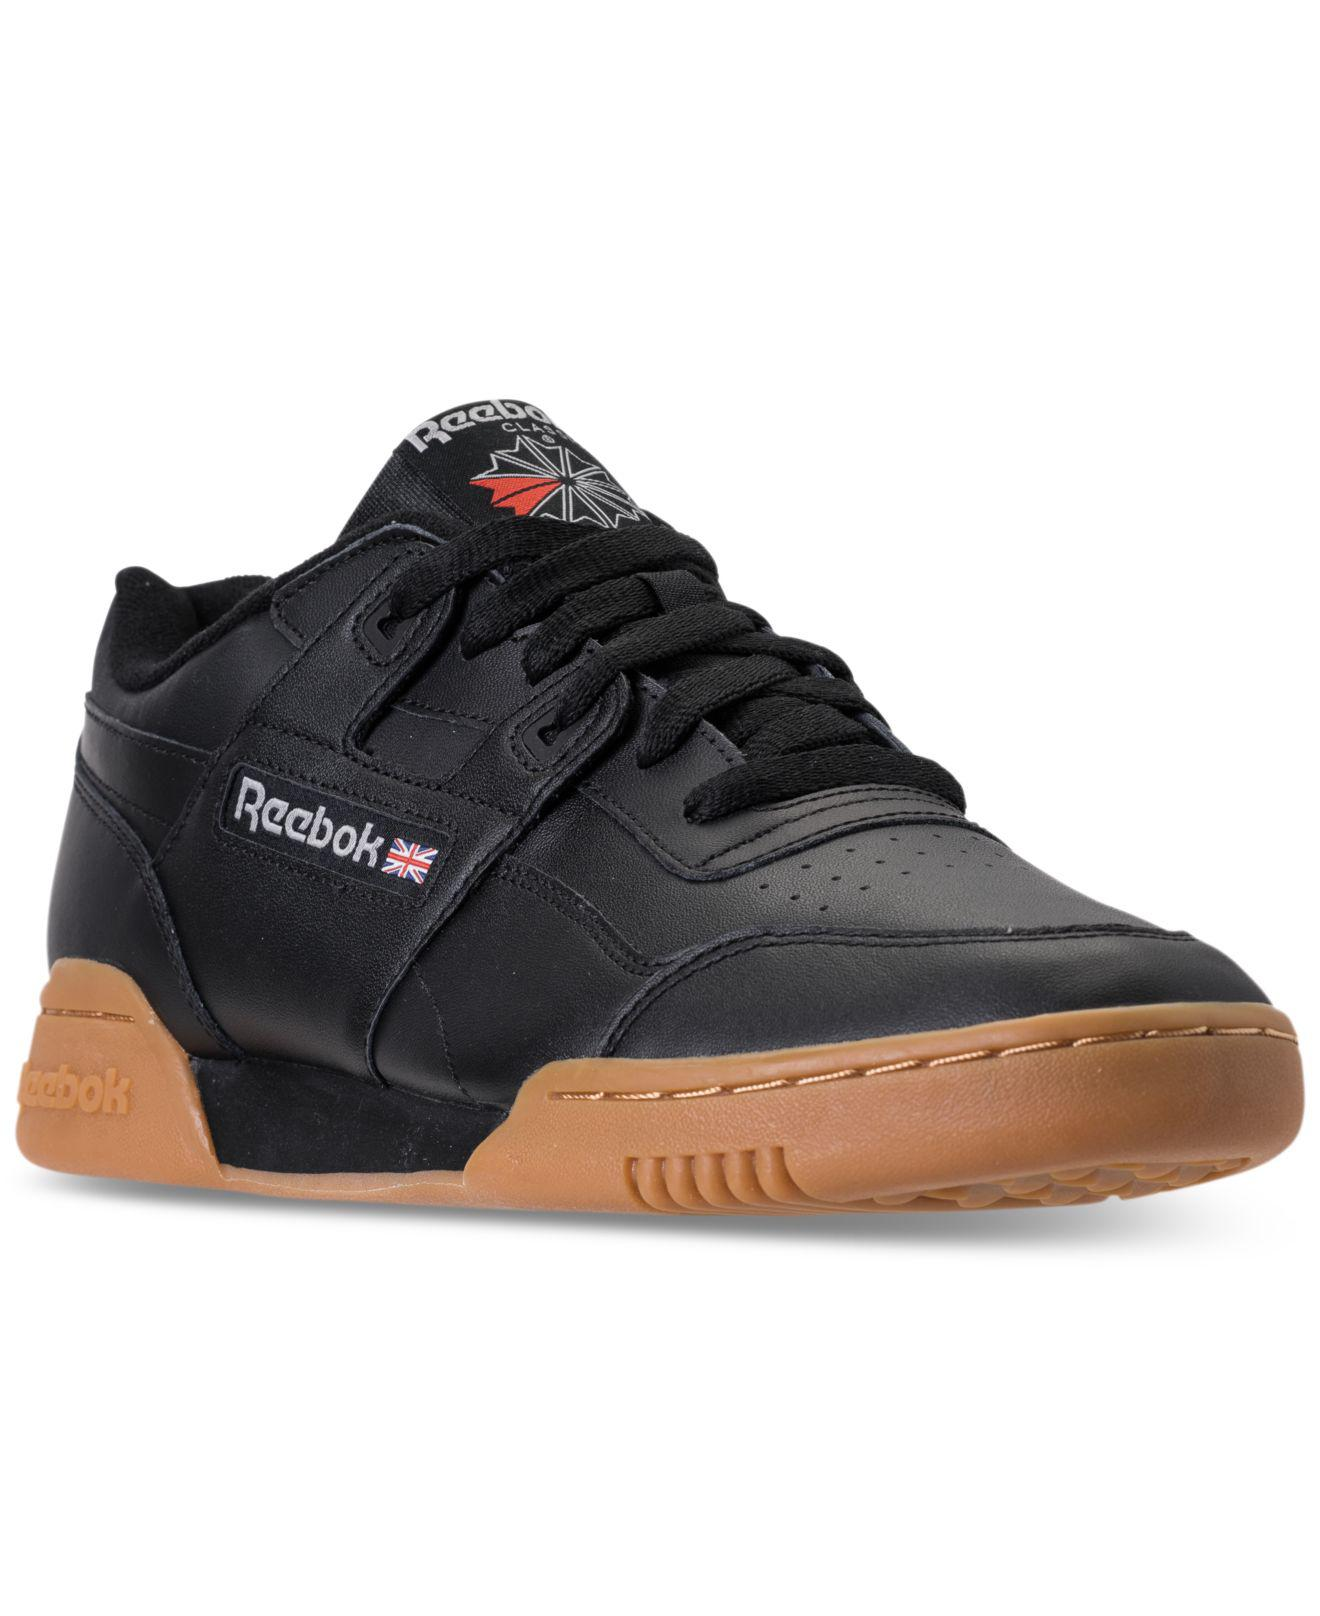 Reebok - Black Men s Workout Plus Leather Low-top Sneakers for Men - Lyst.  View fullscreen 00a9cd97b